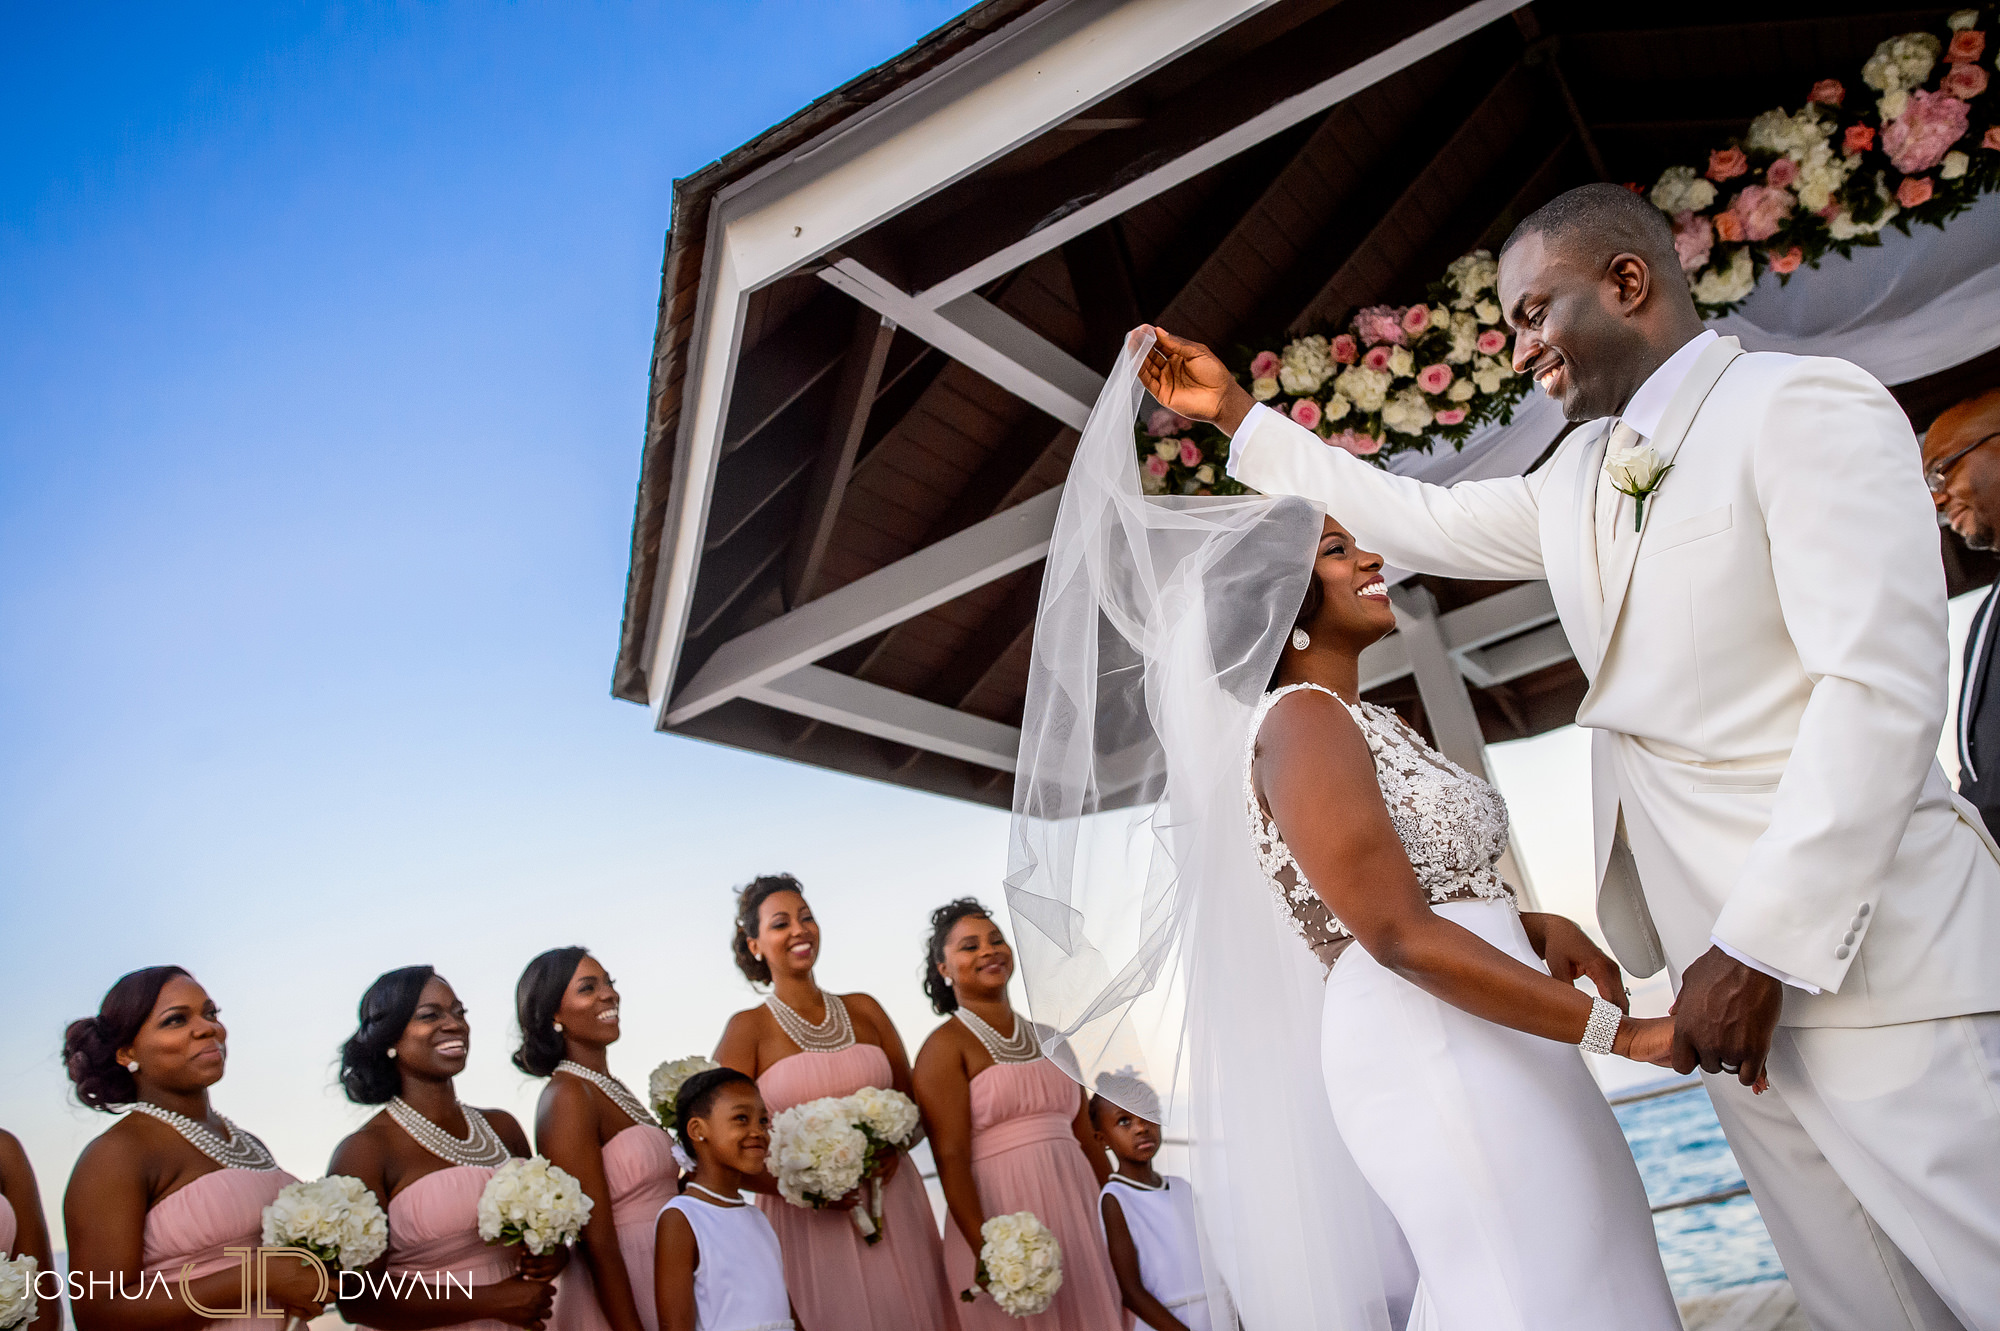 joshua-dwain-weddings-gallery-best-wedding-photographers-us-009